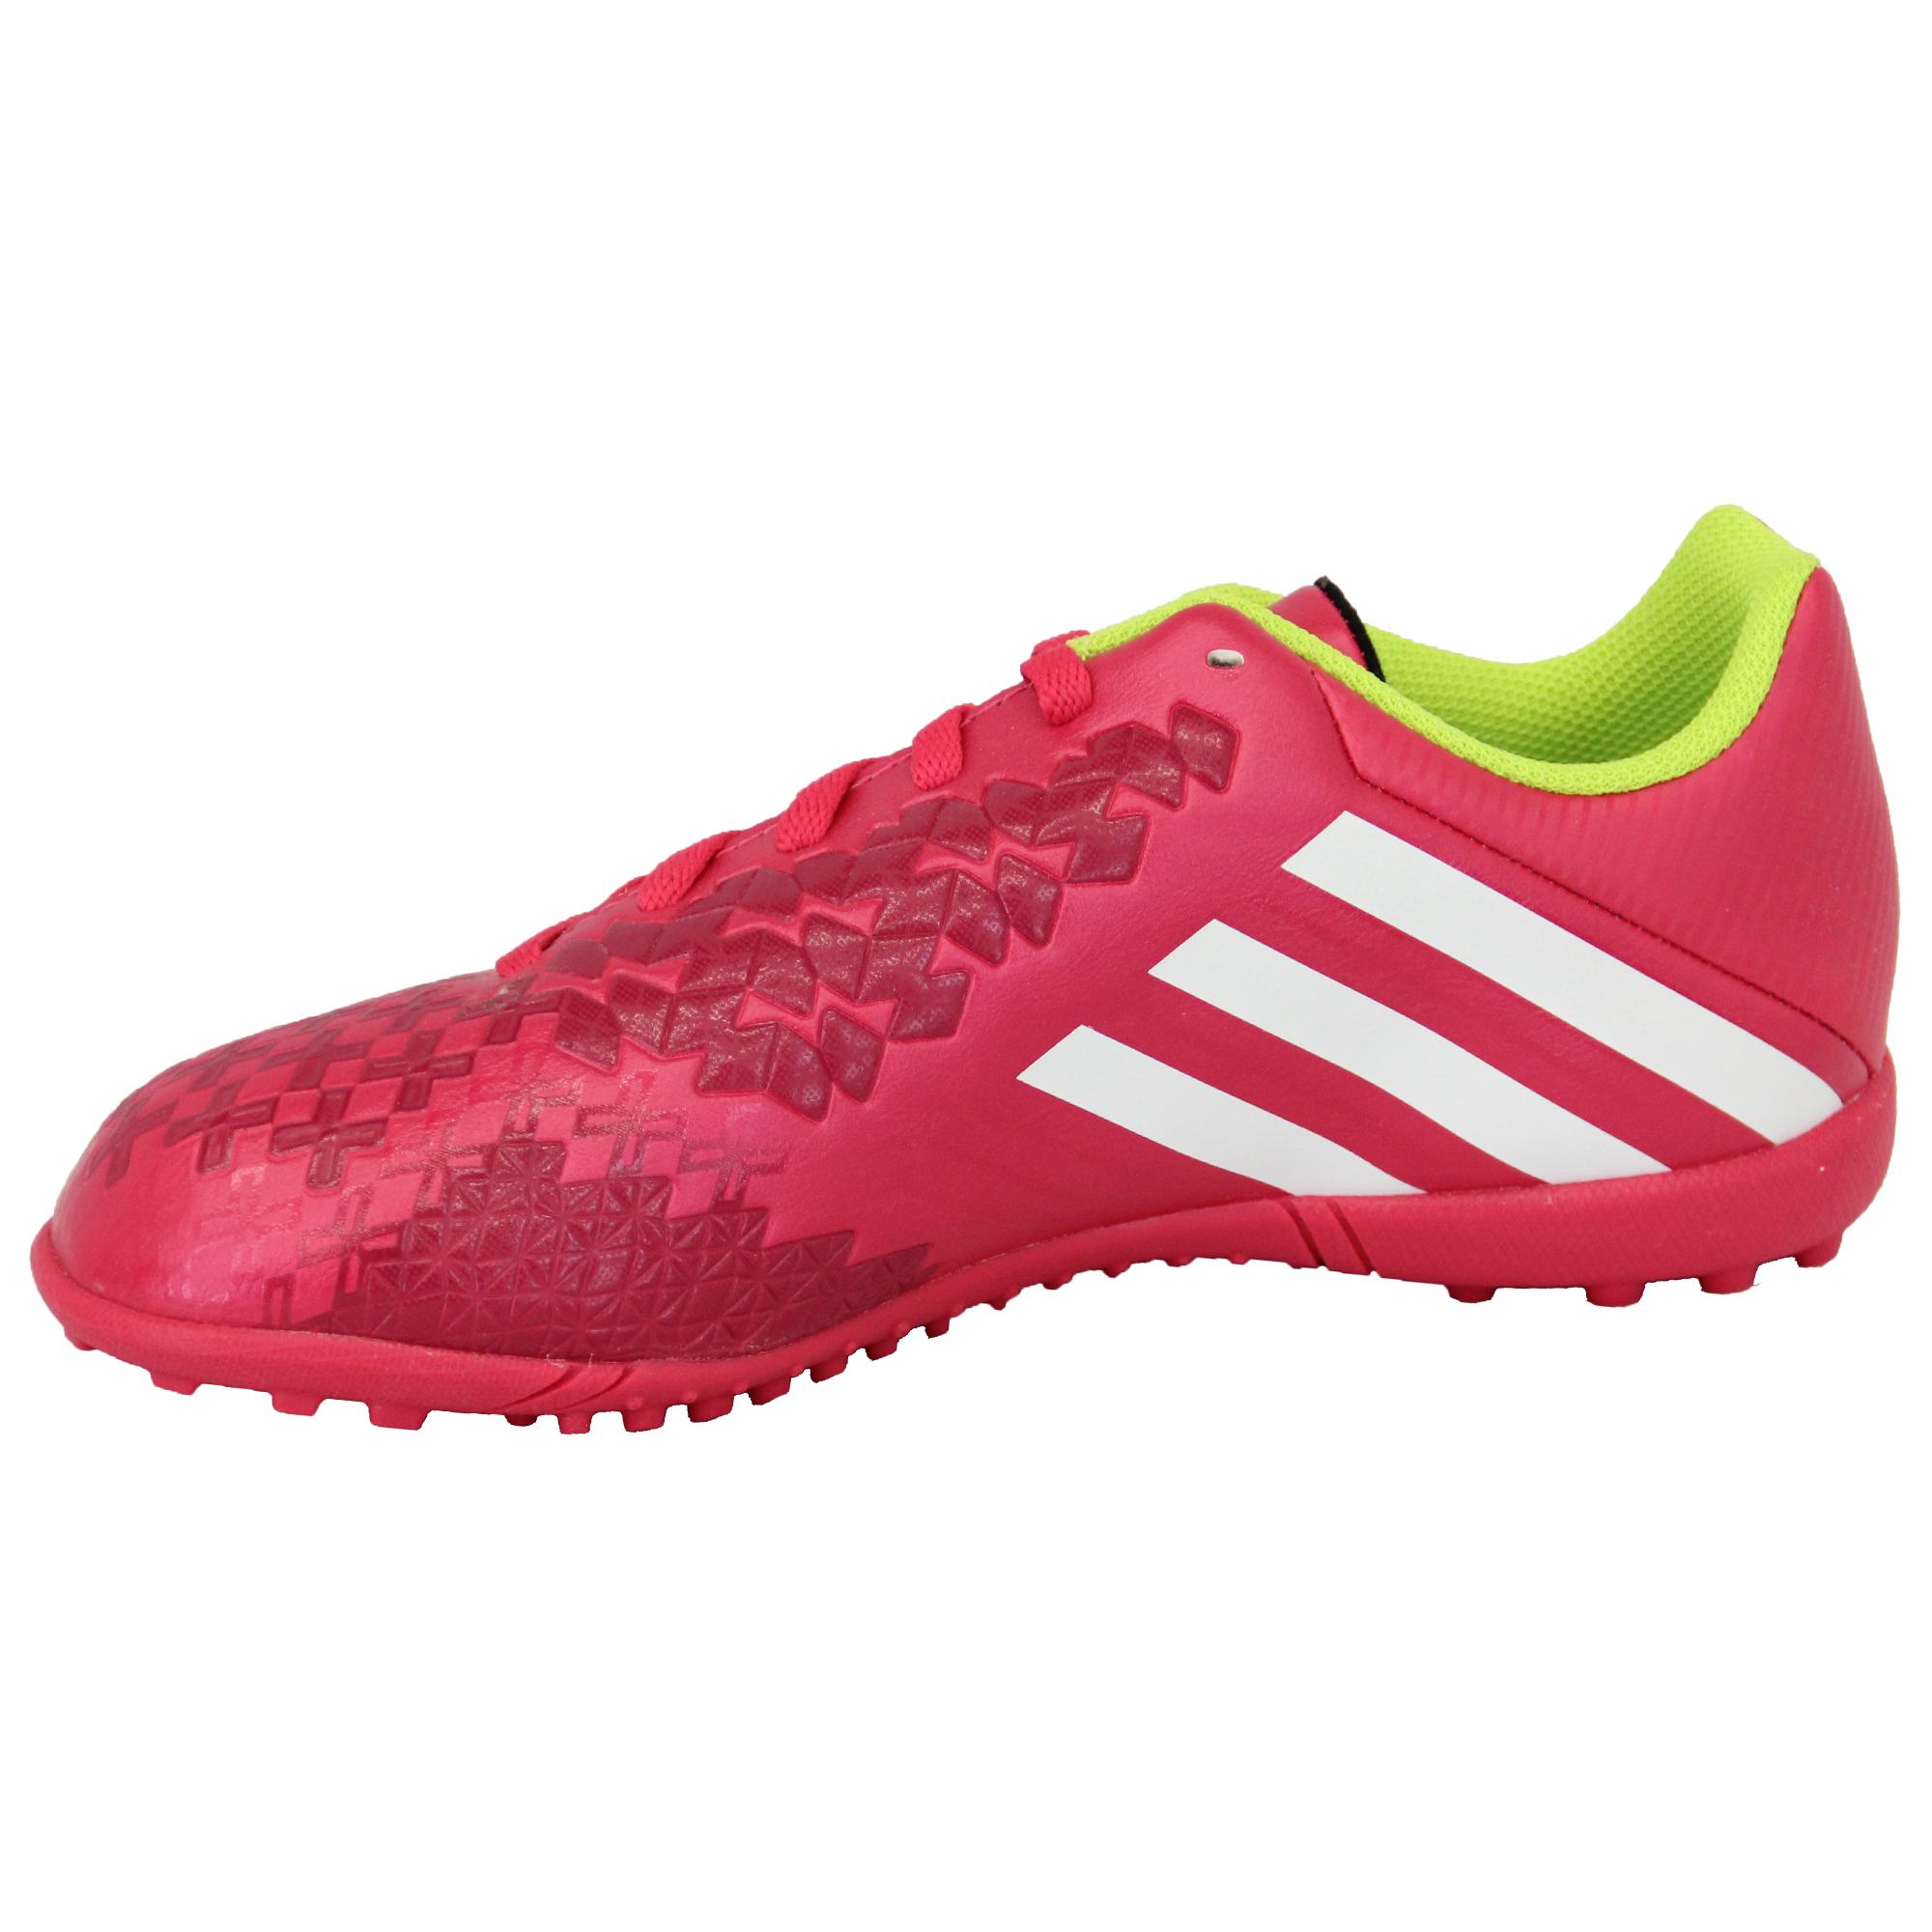 Adidas Astro Turf Shoes